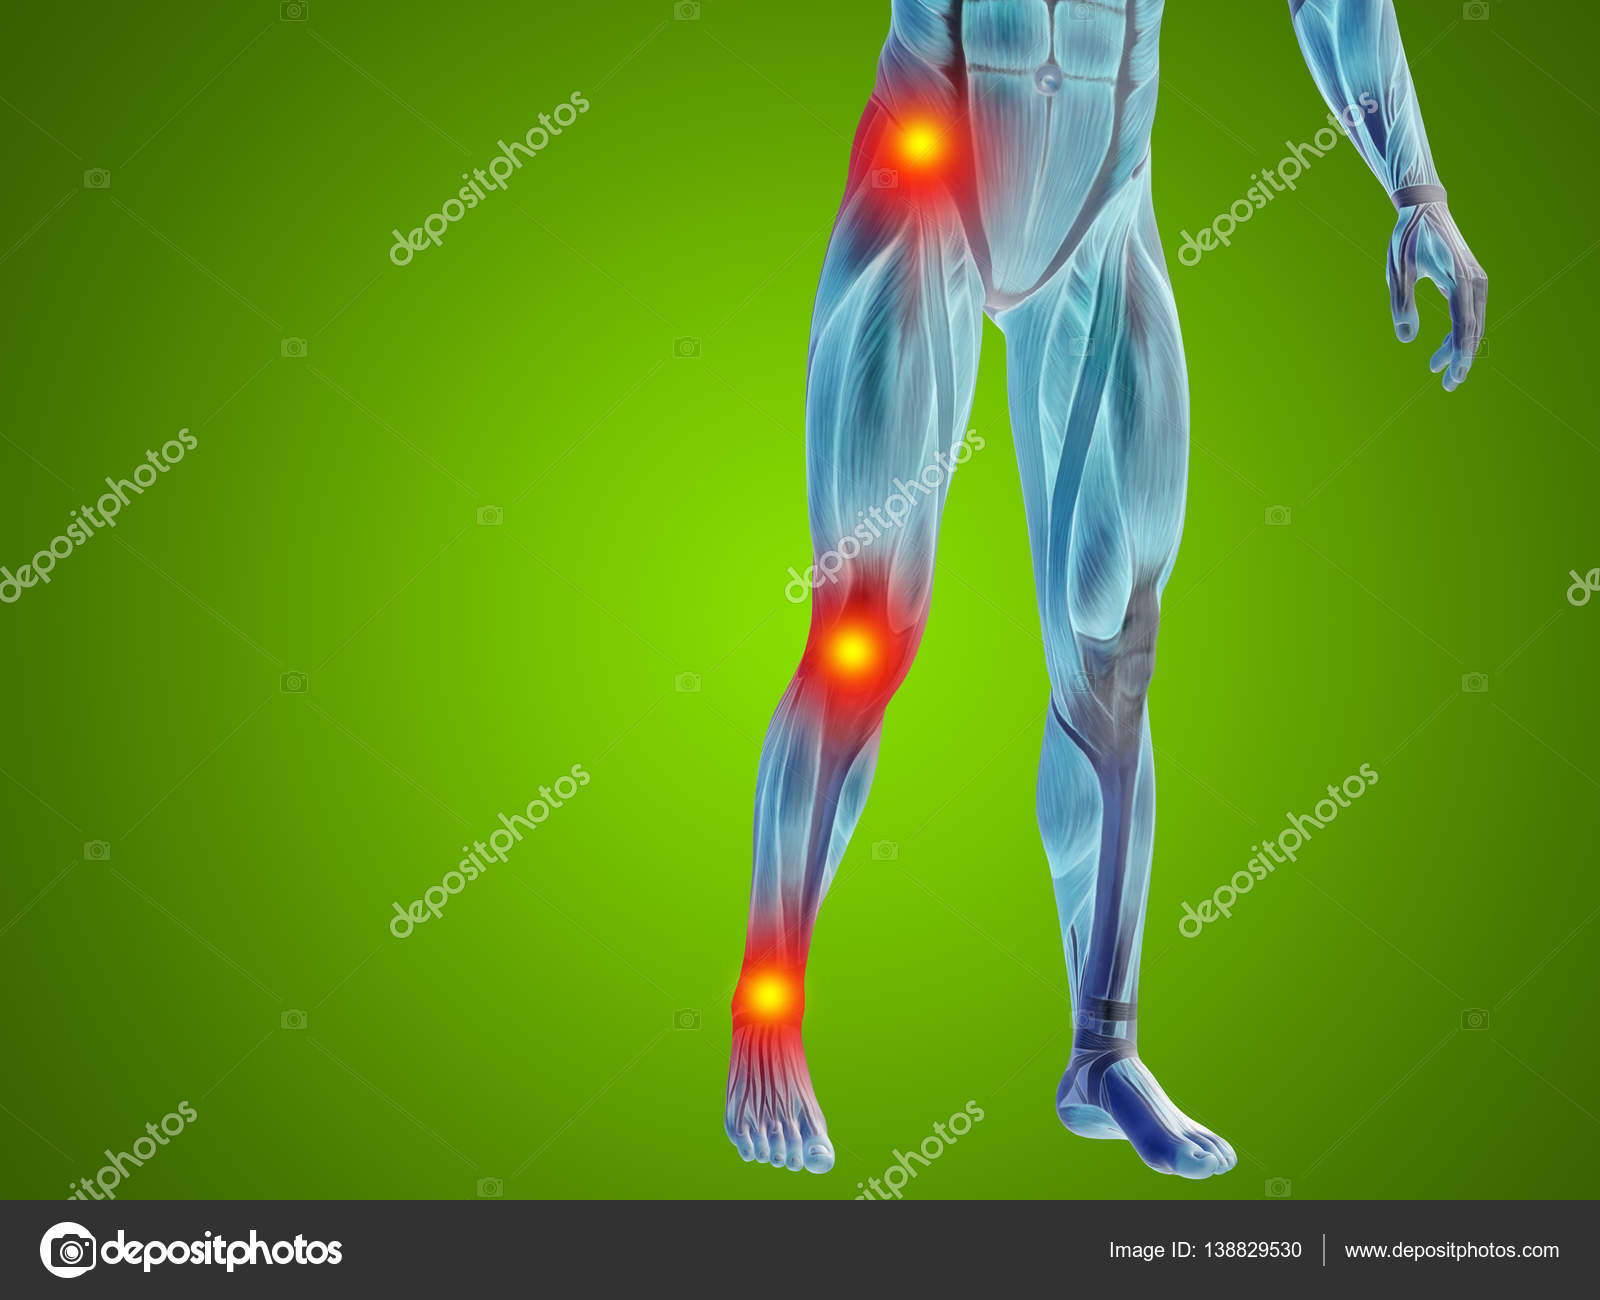 Human Lower Body Anatomy Stock Photo Design36 138829530